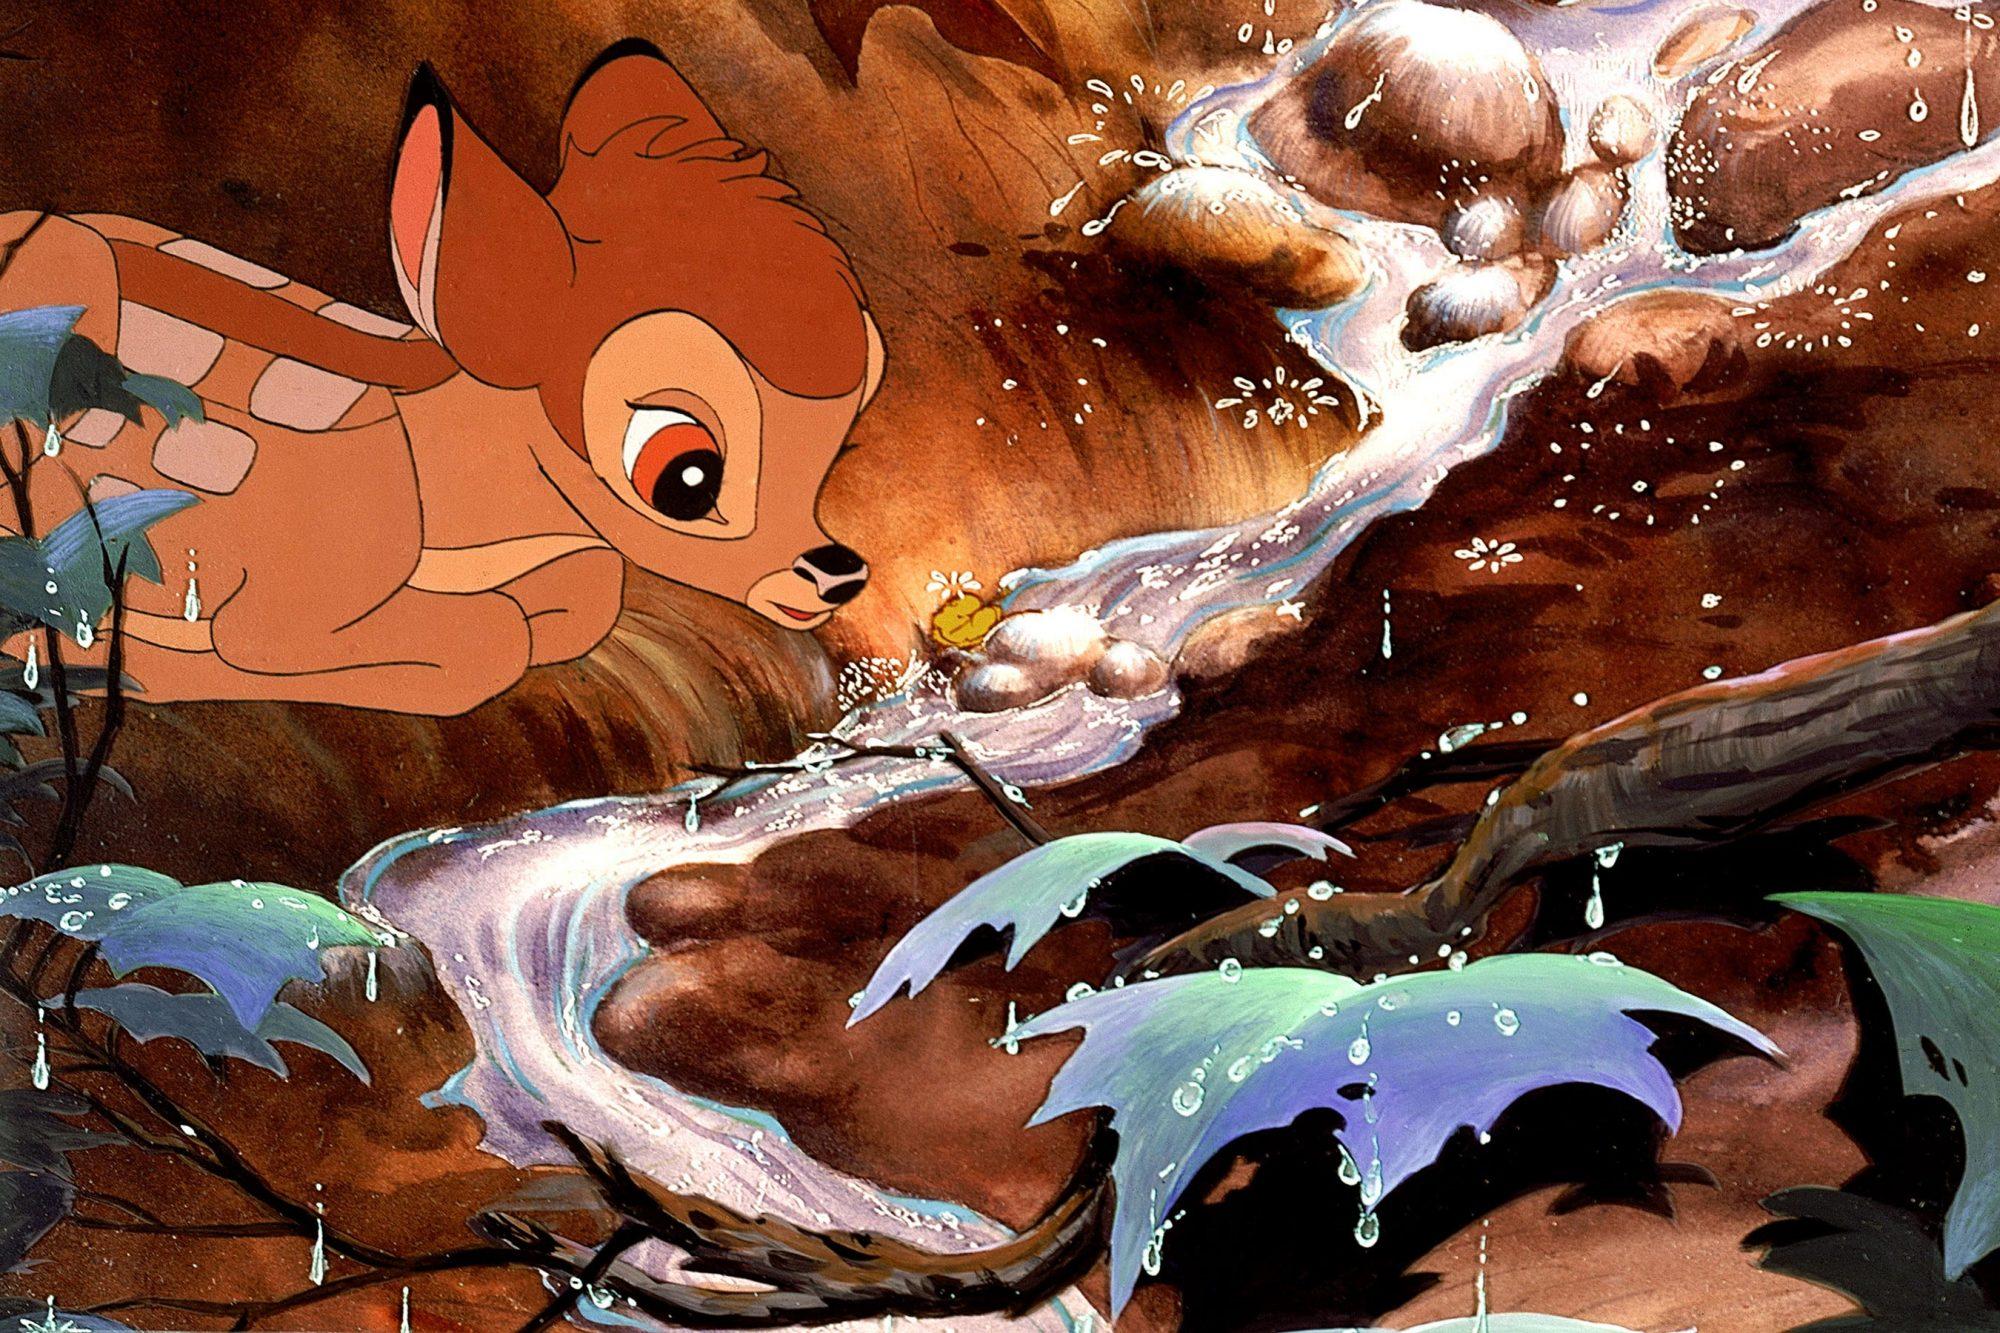 BAMBI, Bambi, 1942. © Walt Disney / Courtesy: Everett Collection